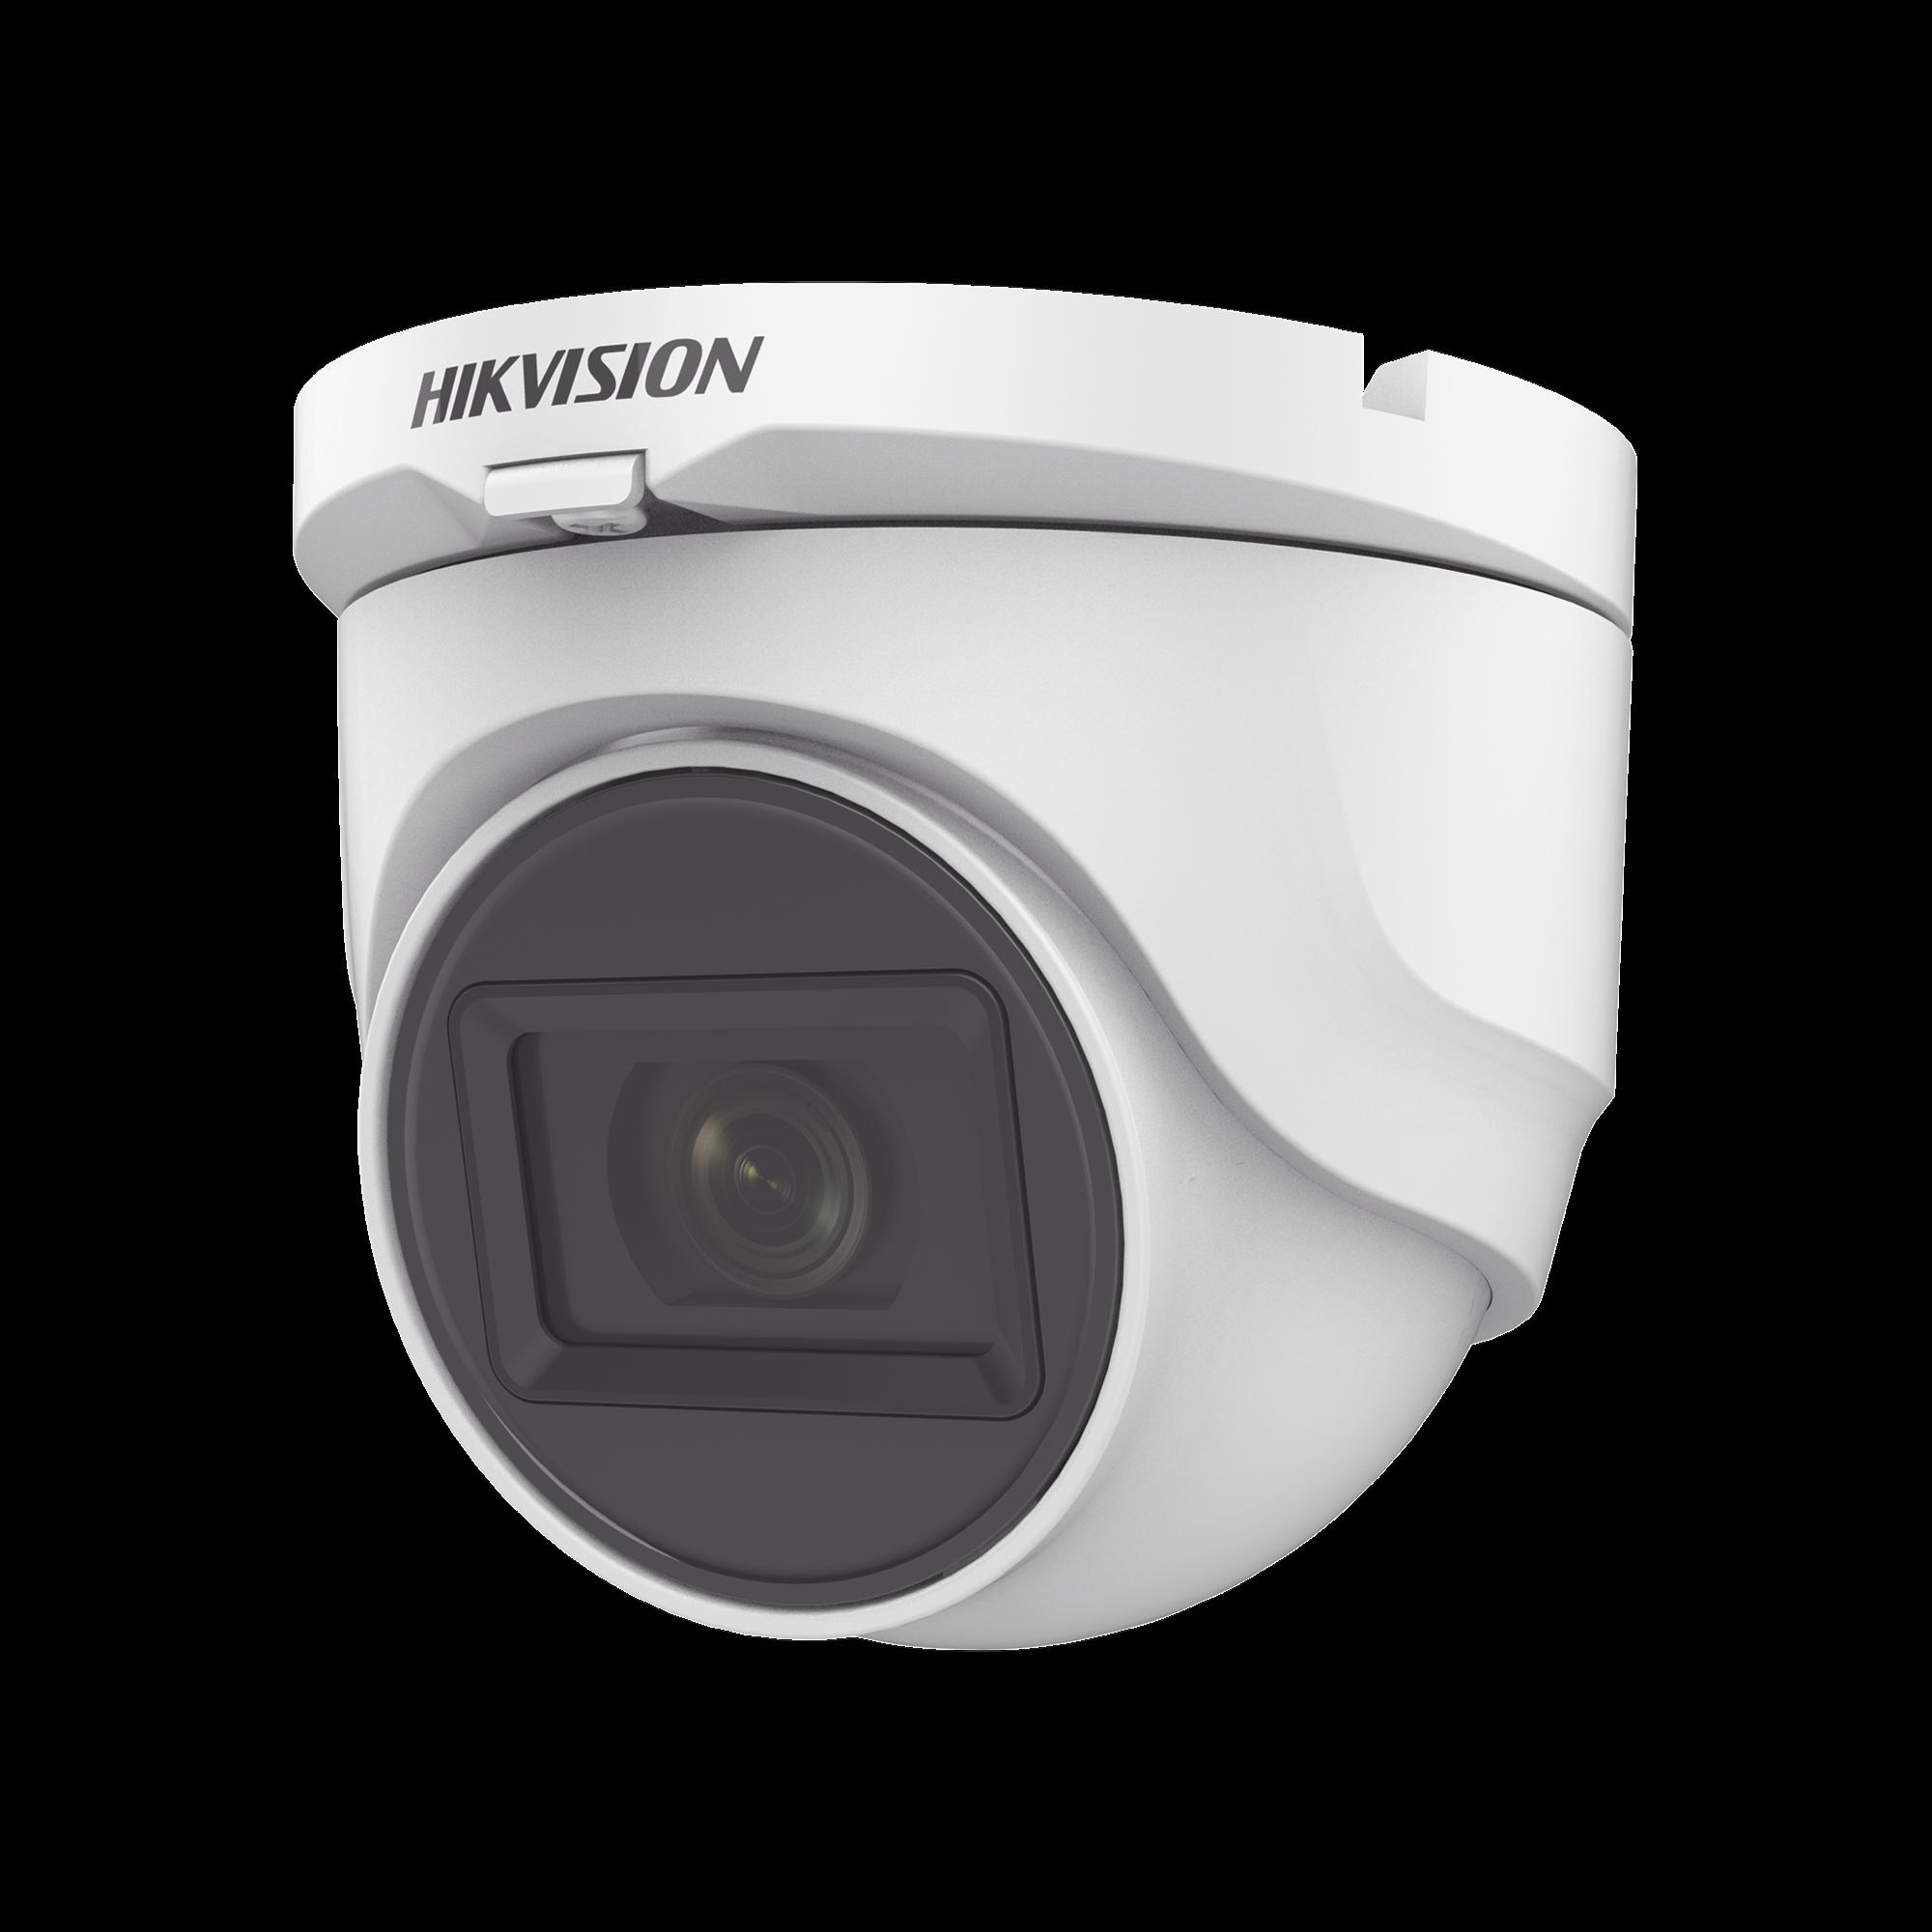 Domo TURBOHD 1080p / Gran Angular 106? / Lente 2.8 mm / 30 mts IR EXIR / Exterior IP67 / 4 Tecnologías / dWDR